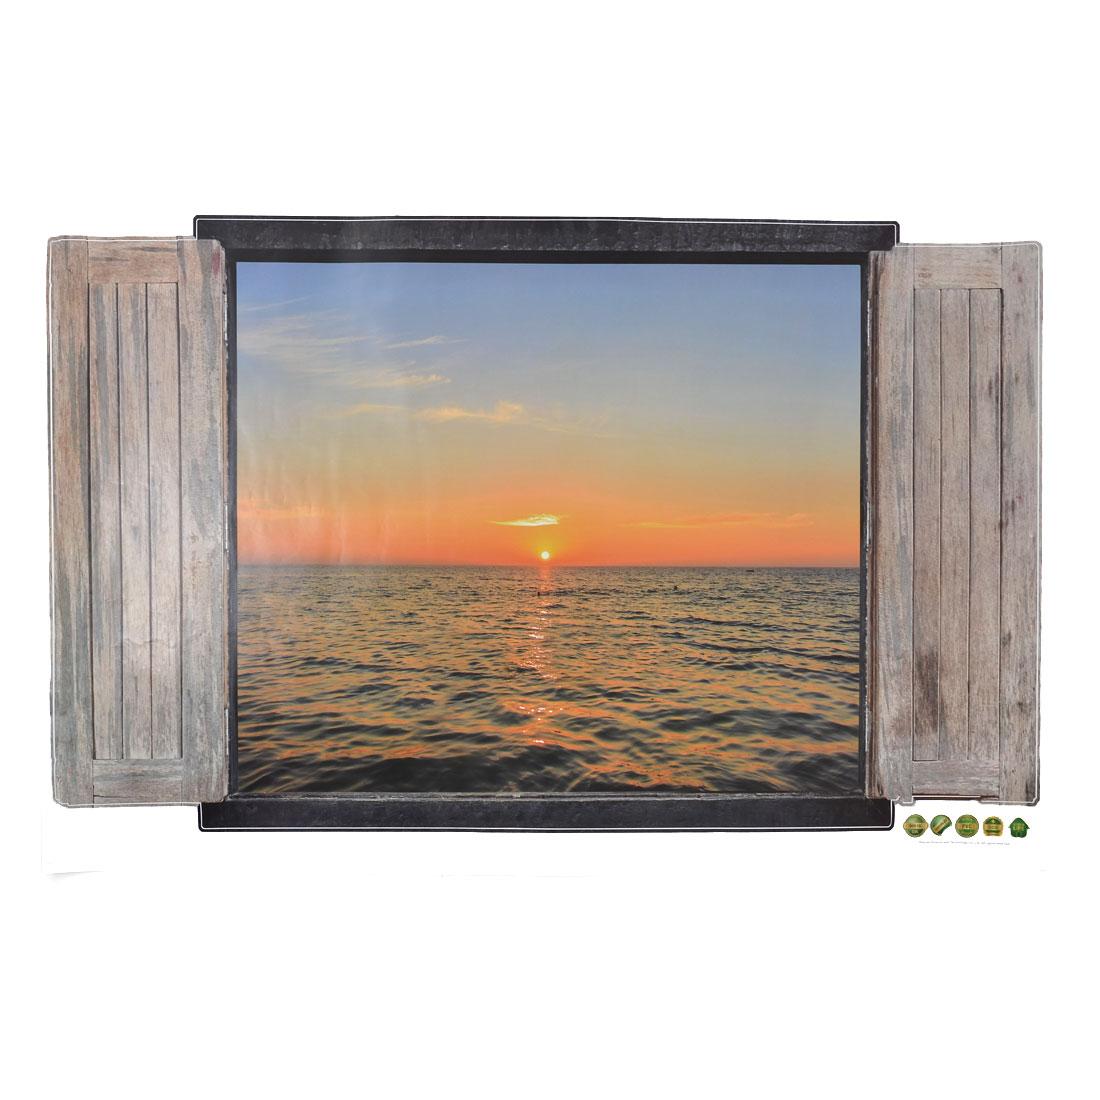 Home PVC Sea Sunset Prints DIY Ornament Wall Sticker Decal Mural 60 x 90cm